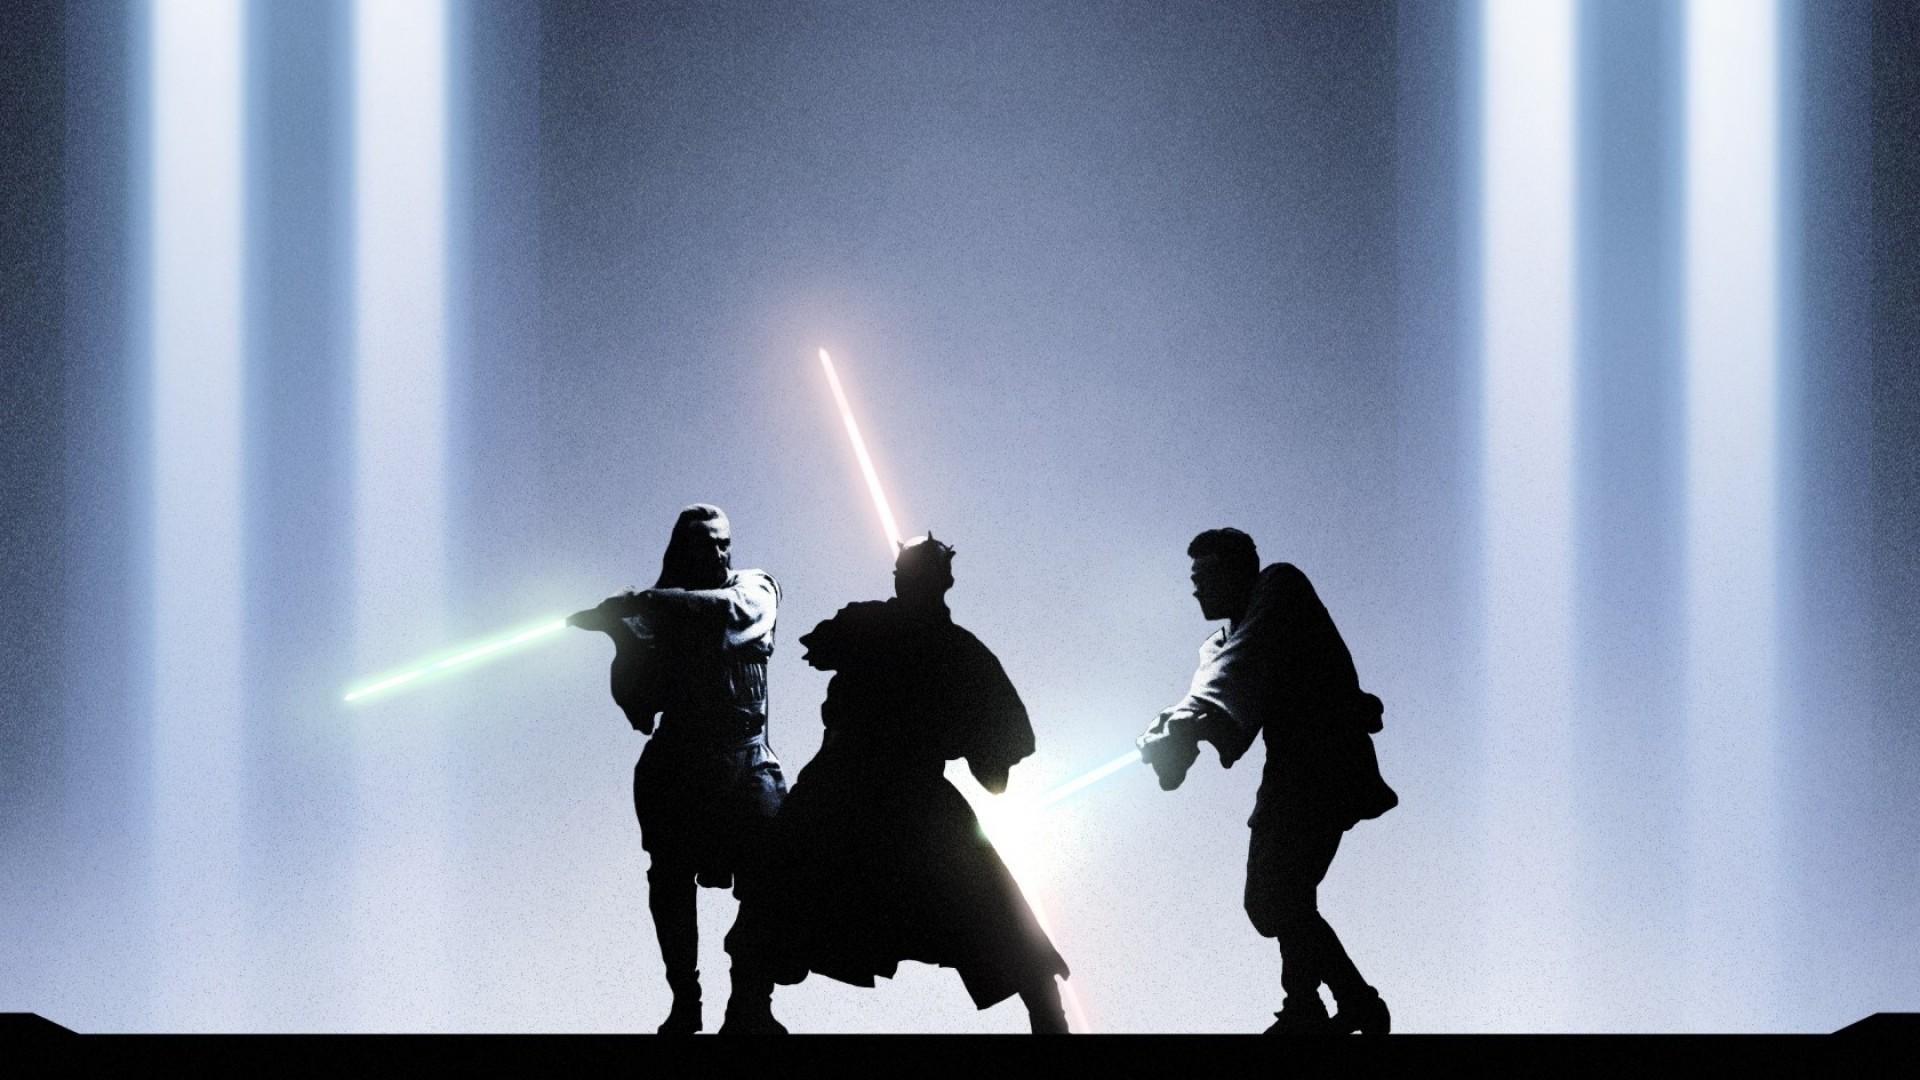 Preview wallpaper star wars, episode i, the phantom menace, qui-gon jinn